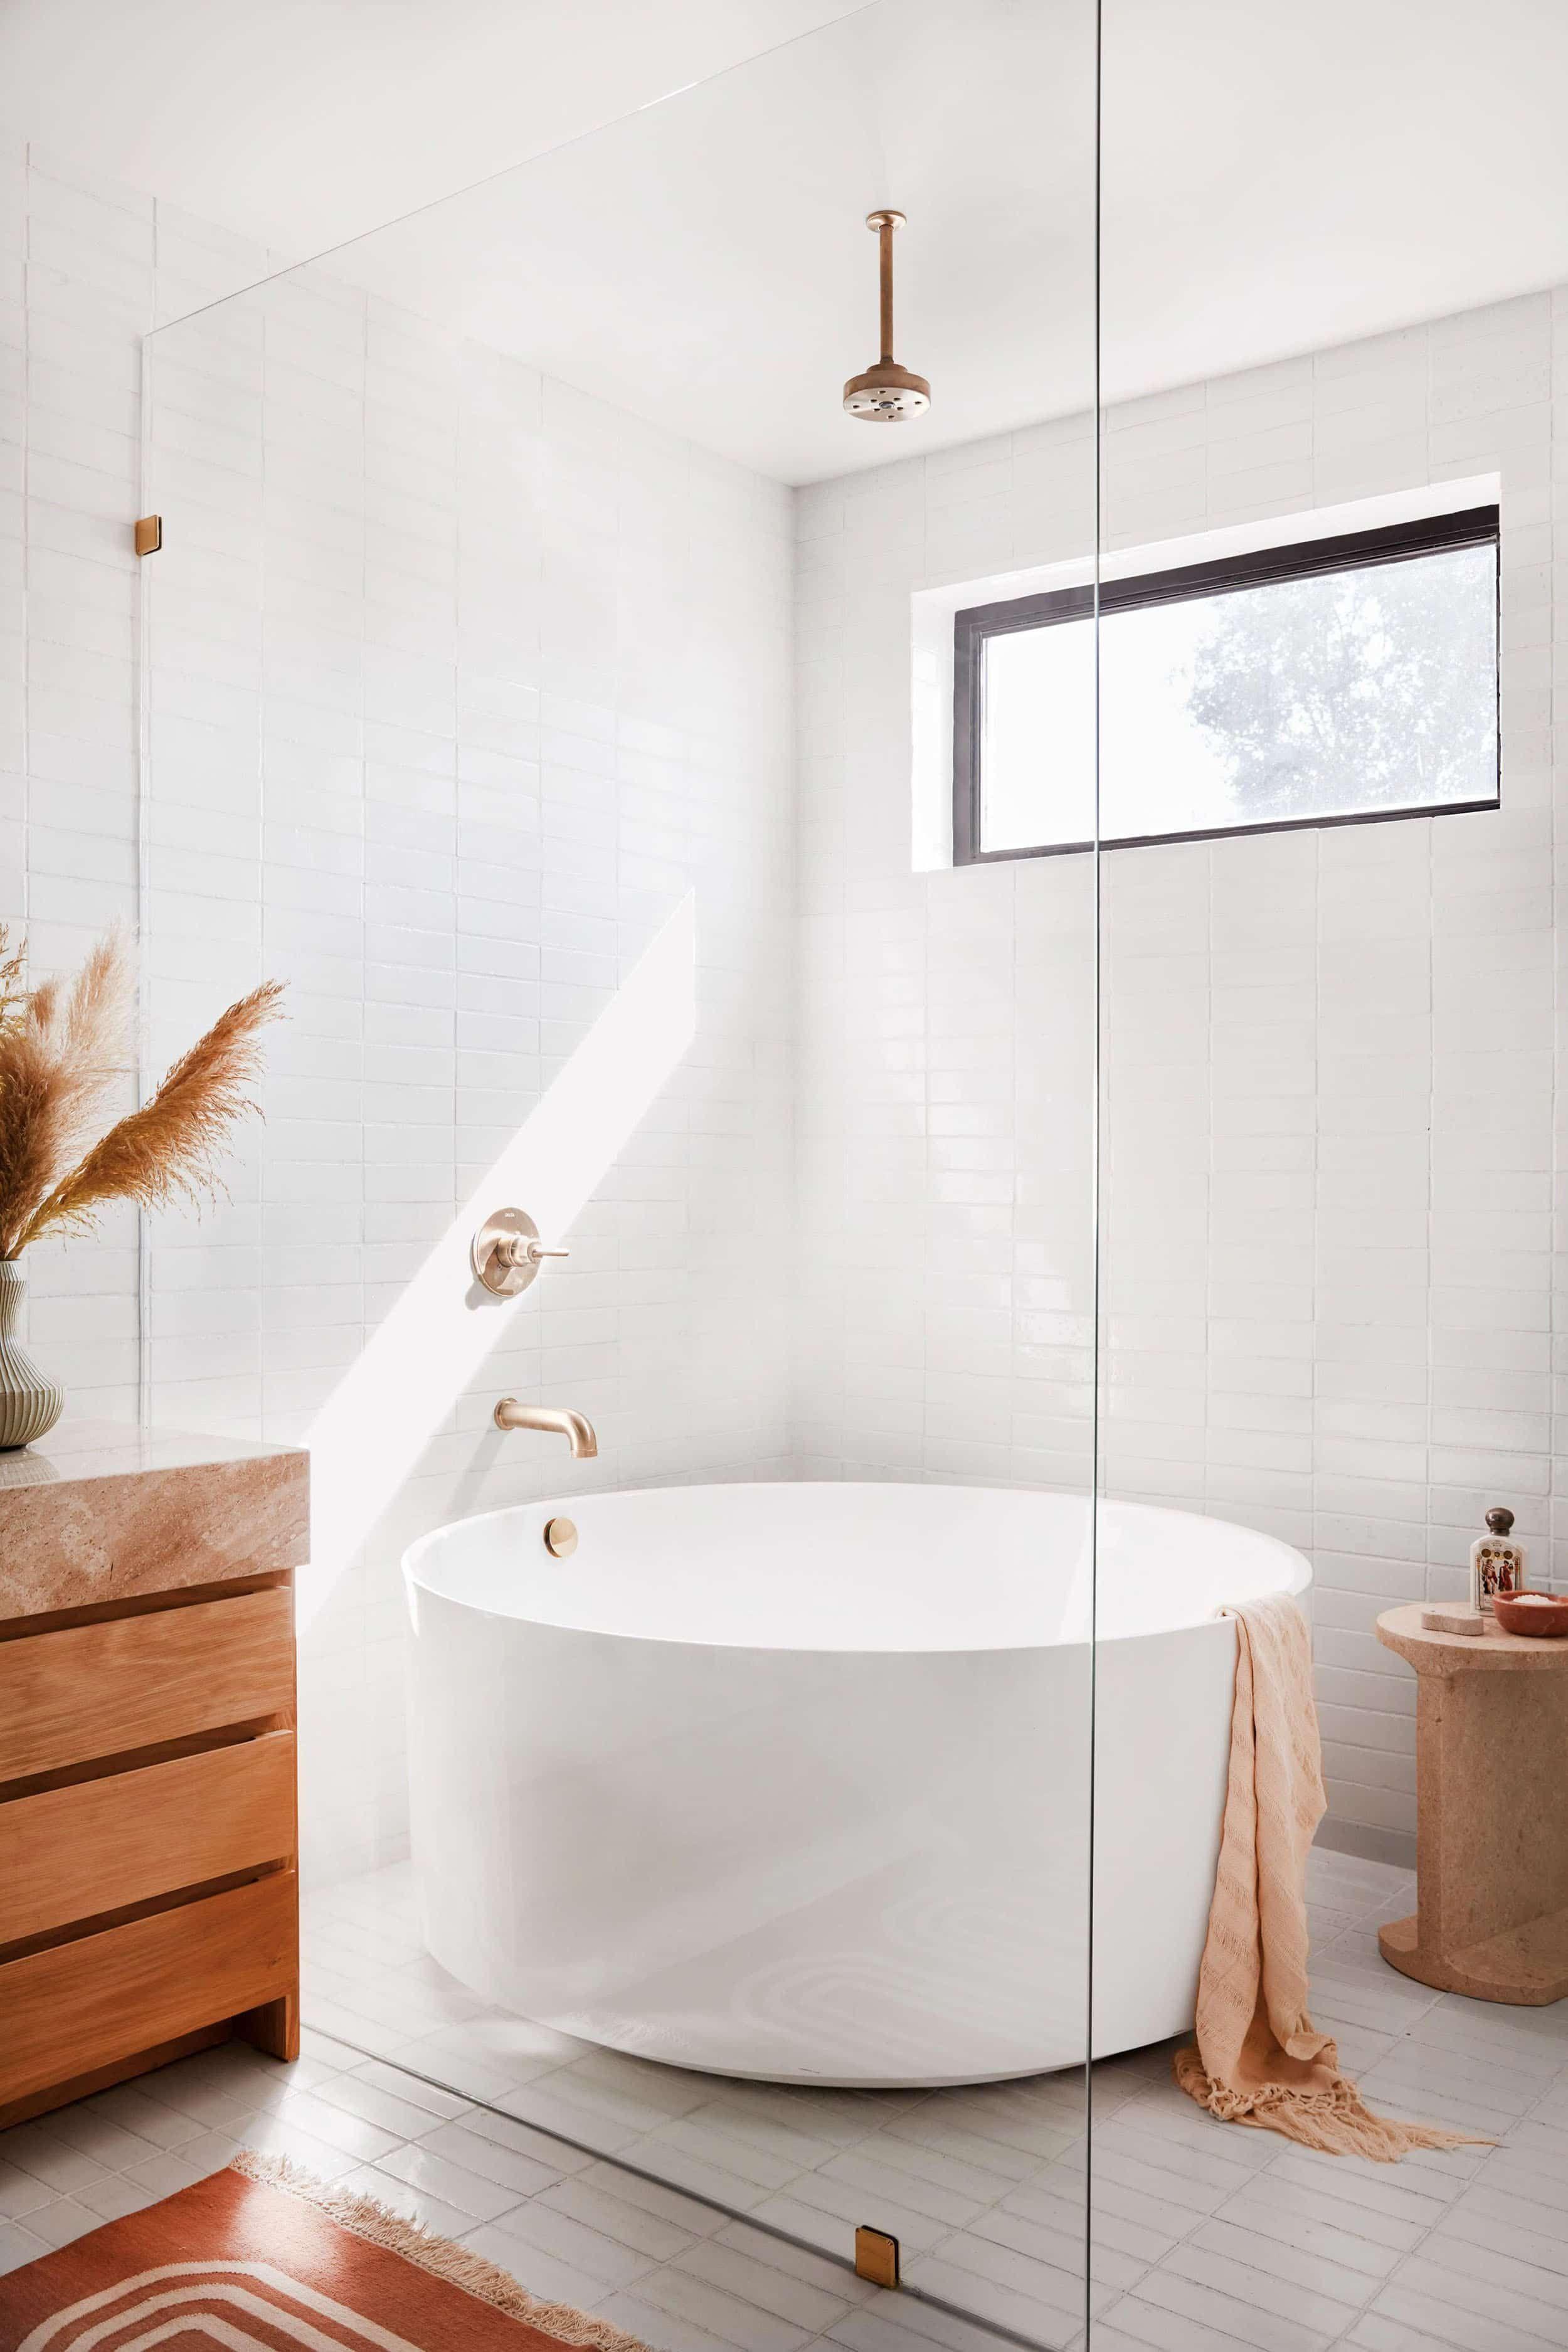 The 9 Best 2020 Bathroom Trends We Wish We Had Right Now Emily Henderson In 2020 Bathroom Trends Cool Room Designs Bathroom Design